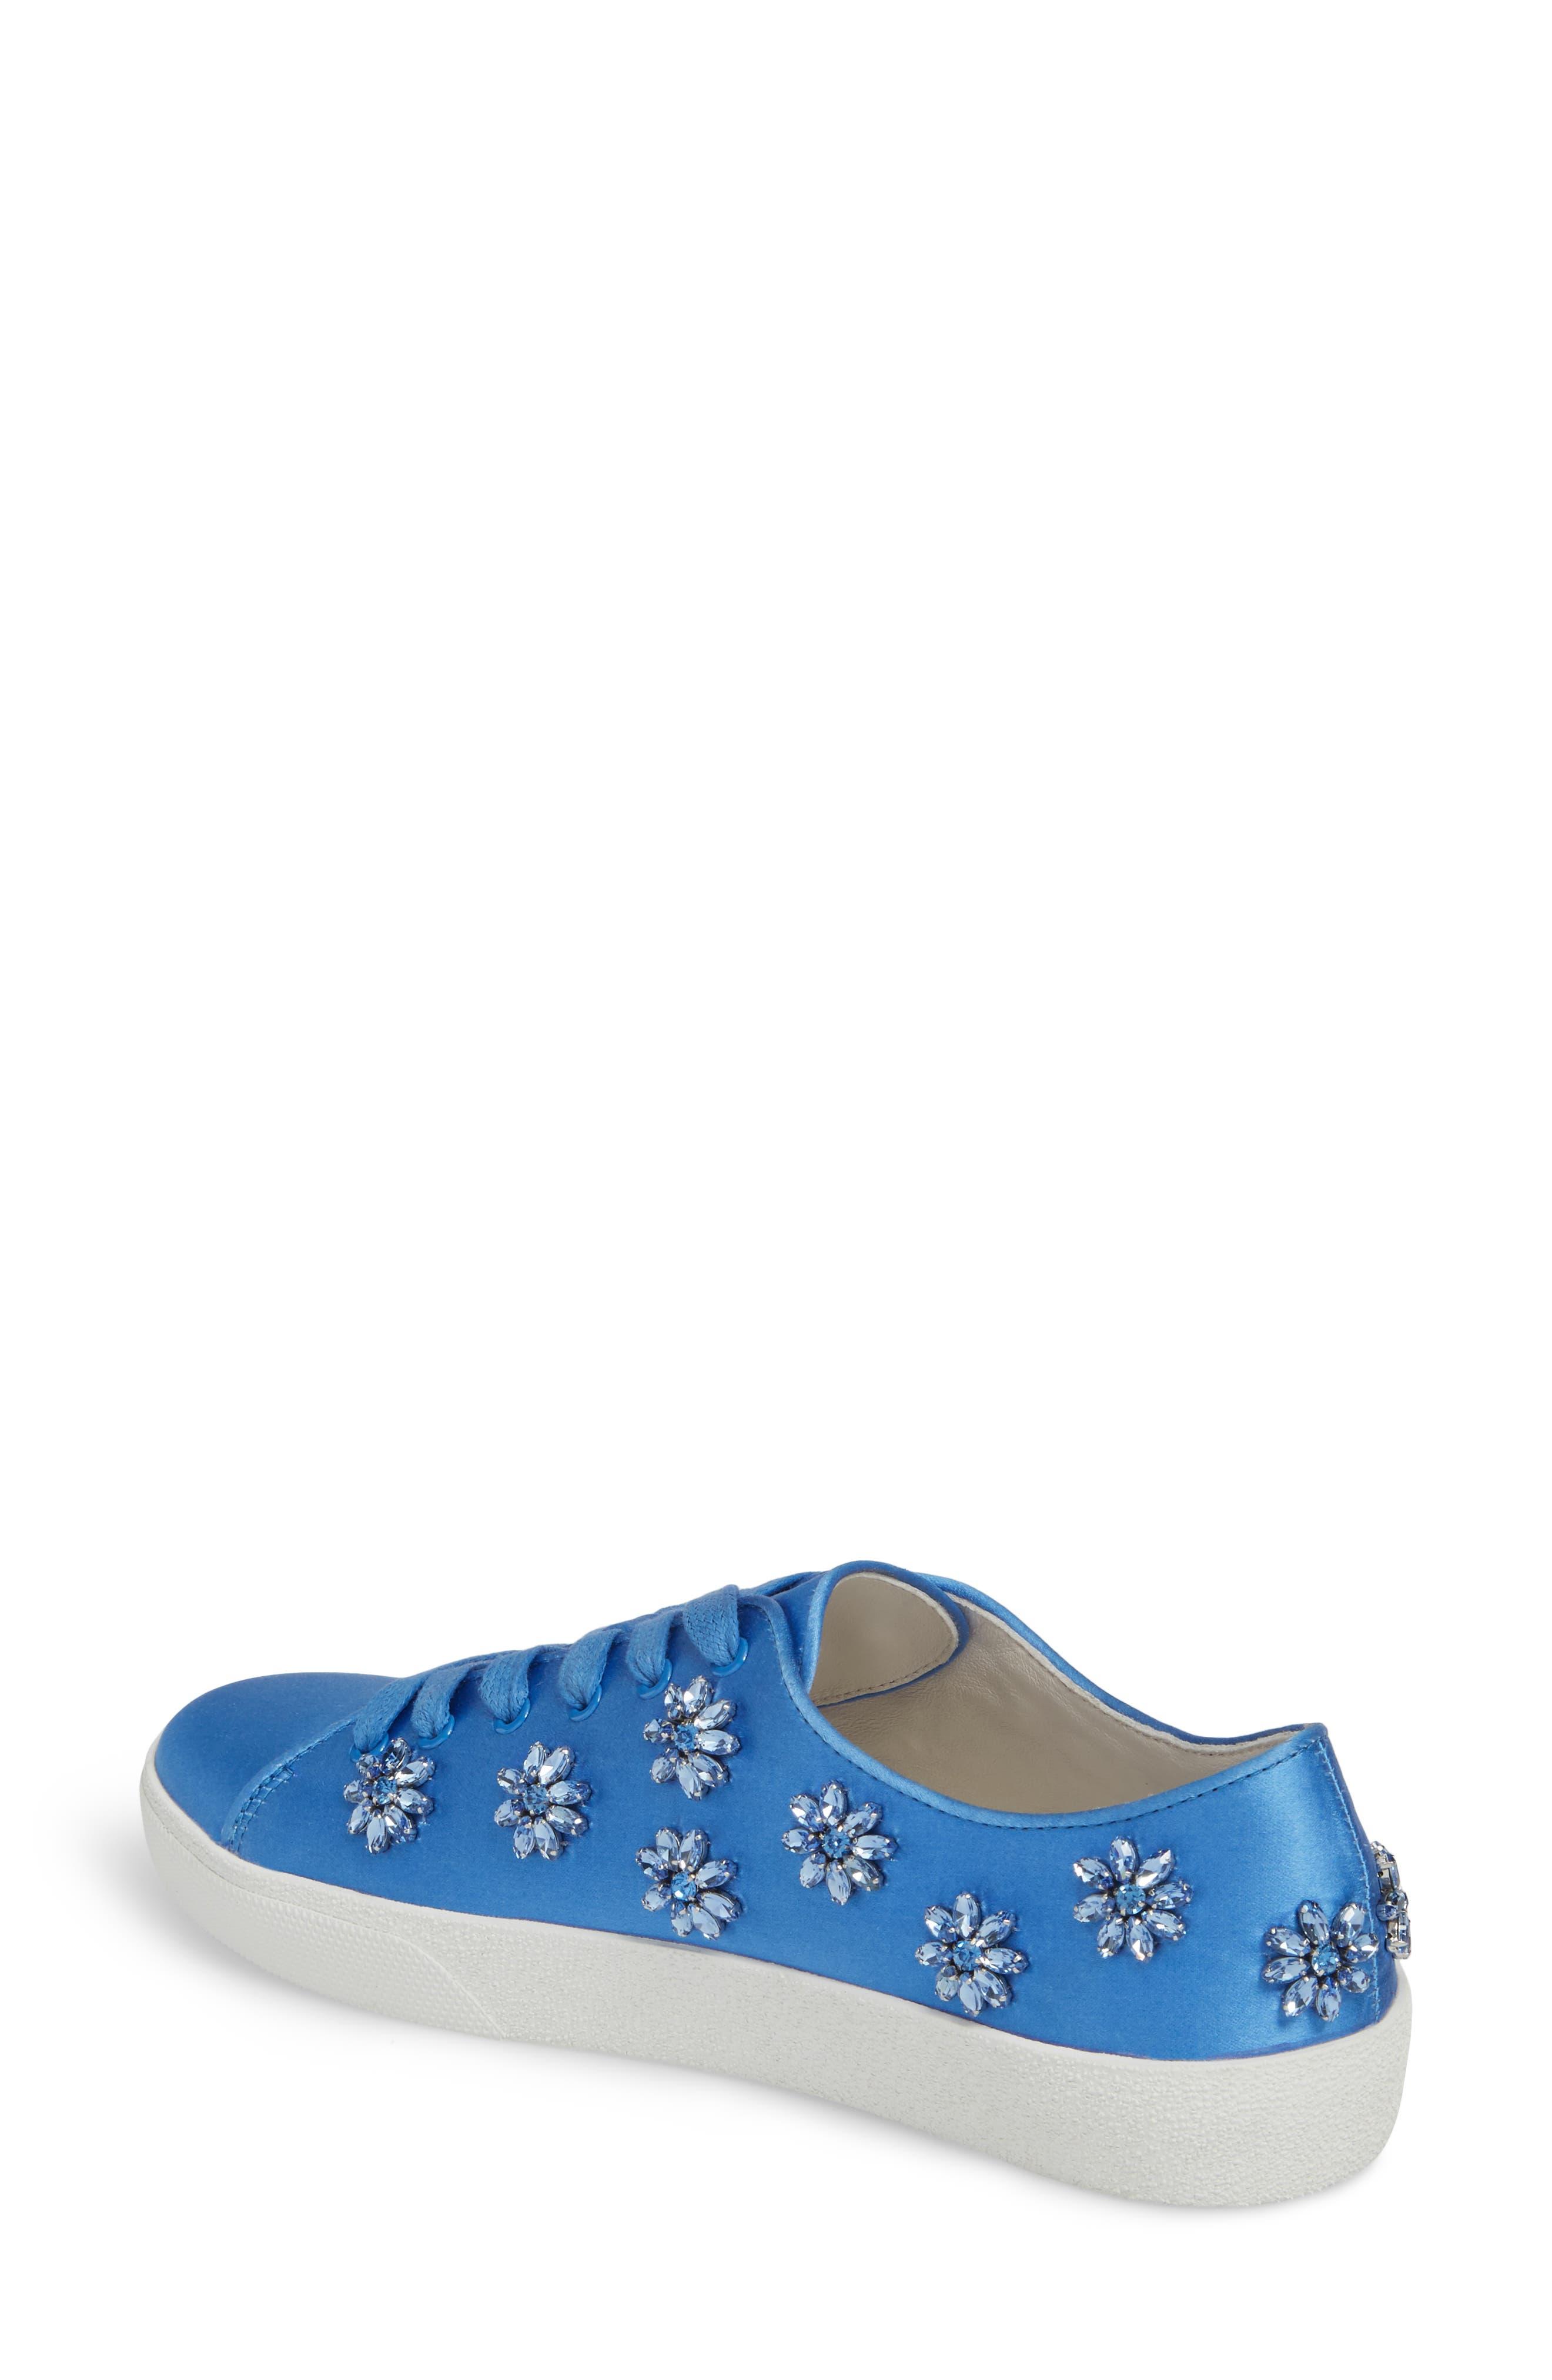 Cleo Crystal Embellished Sneaker,                             Alternate thumbnail 2, color,                             Cerulean